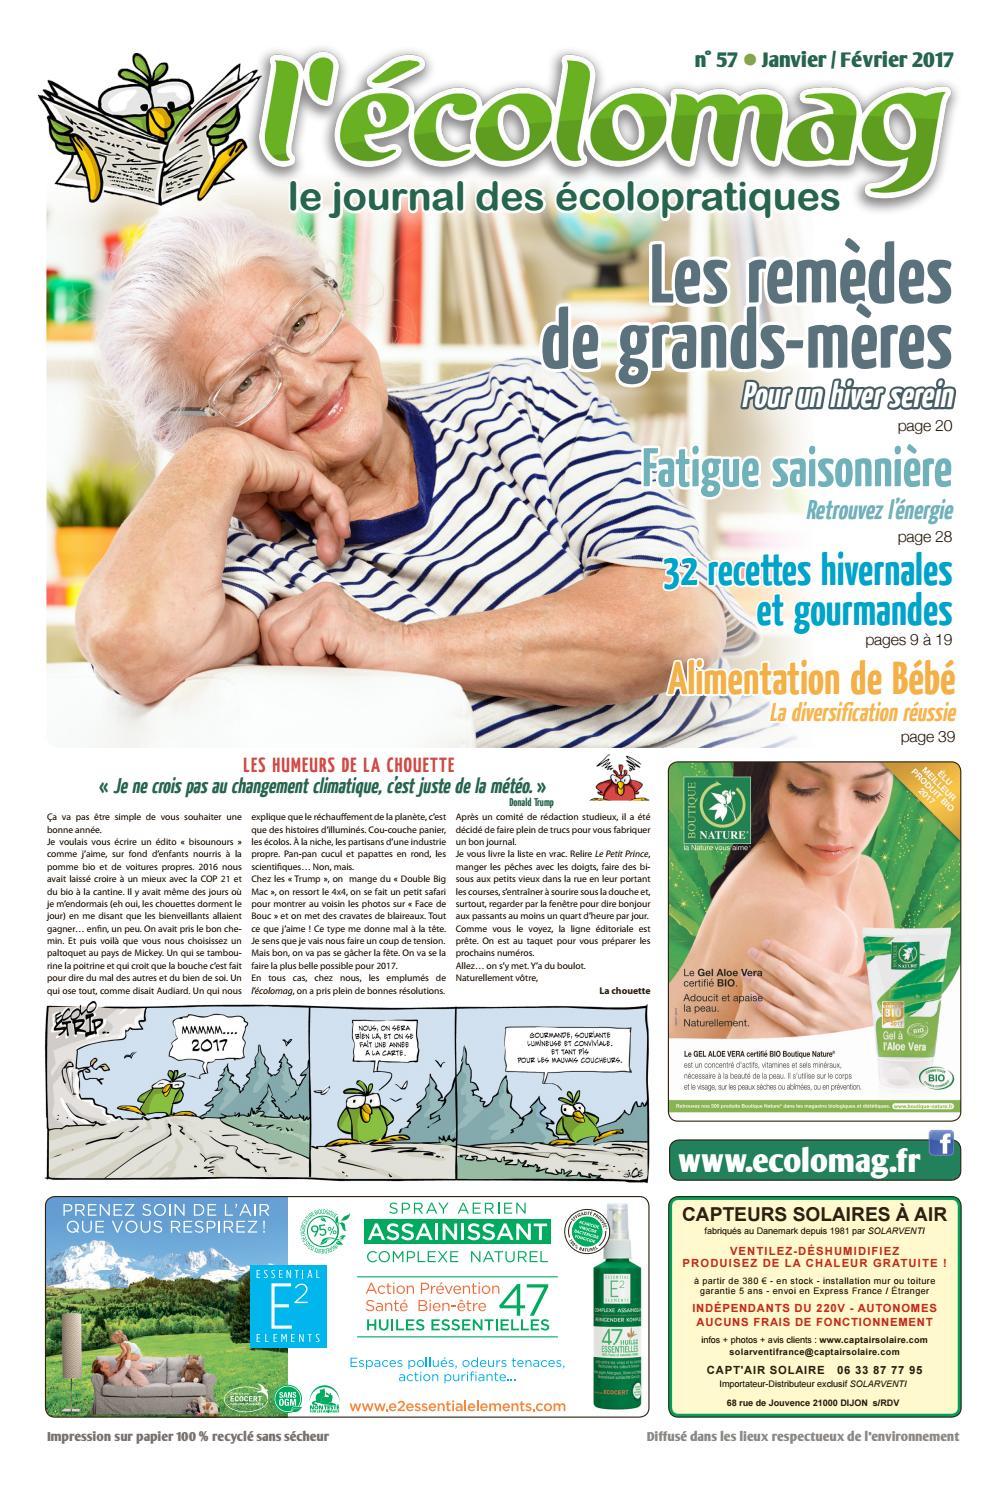 L Ecolomag n°57 by L Ecolomag - issuu 8c4f973c475